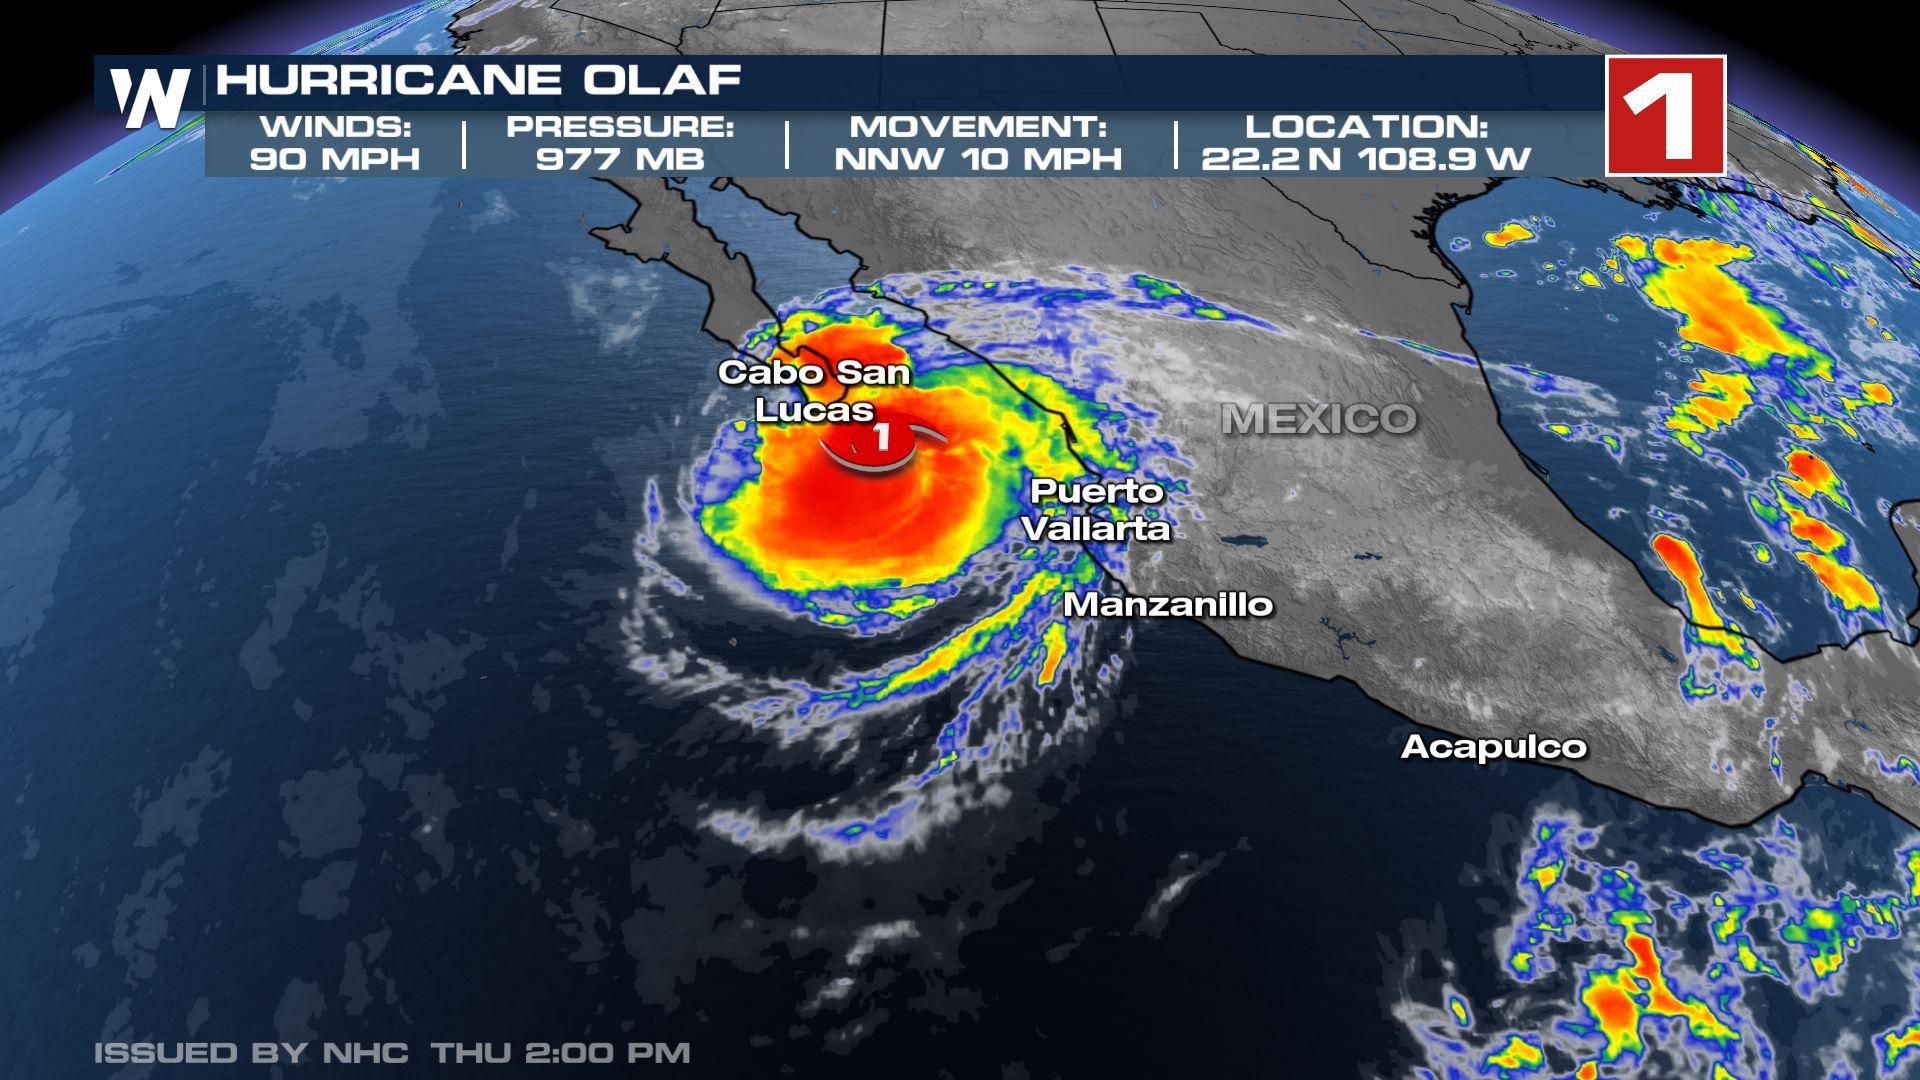 Южна долна Калифорния притихна в очакване на урагана Олаф